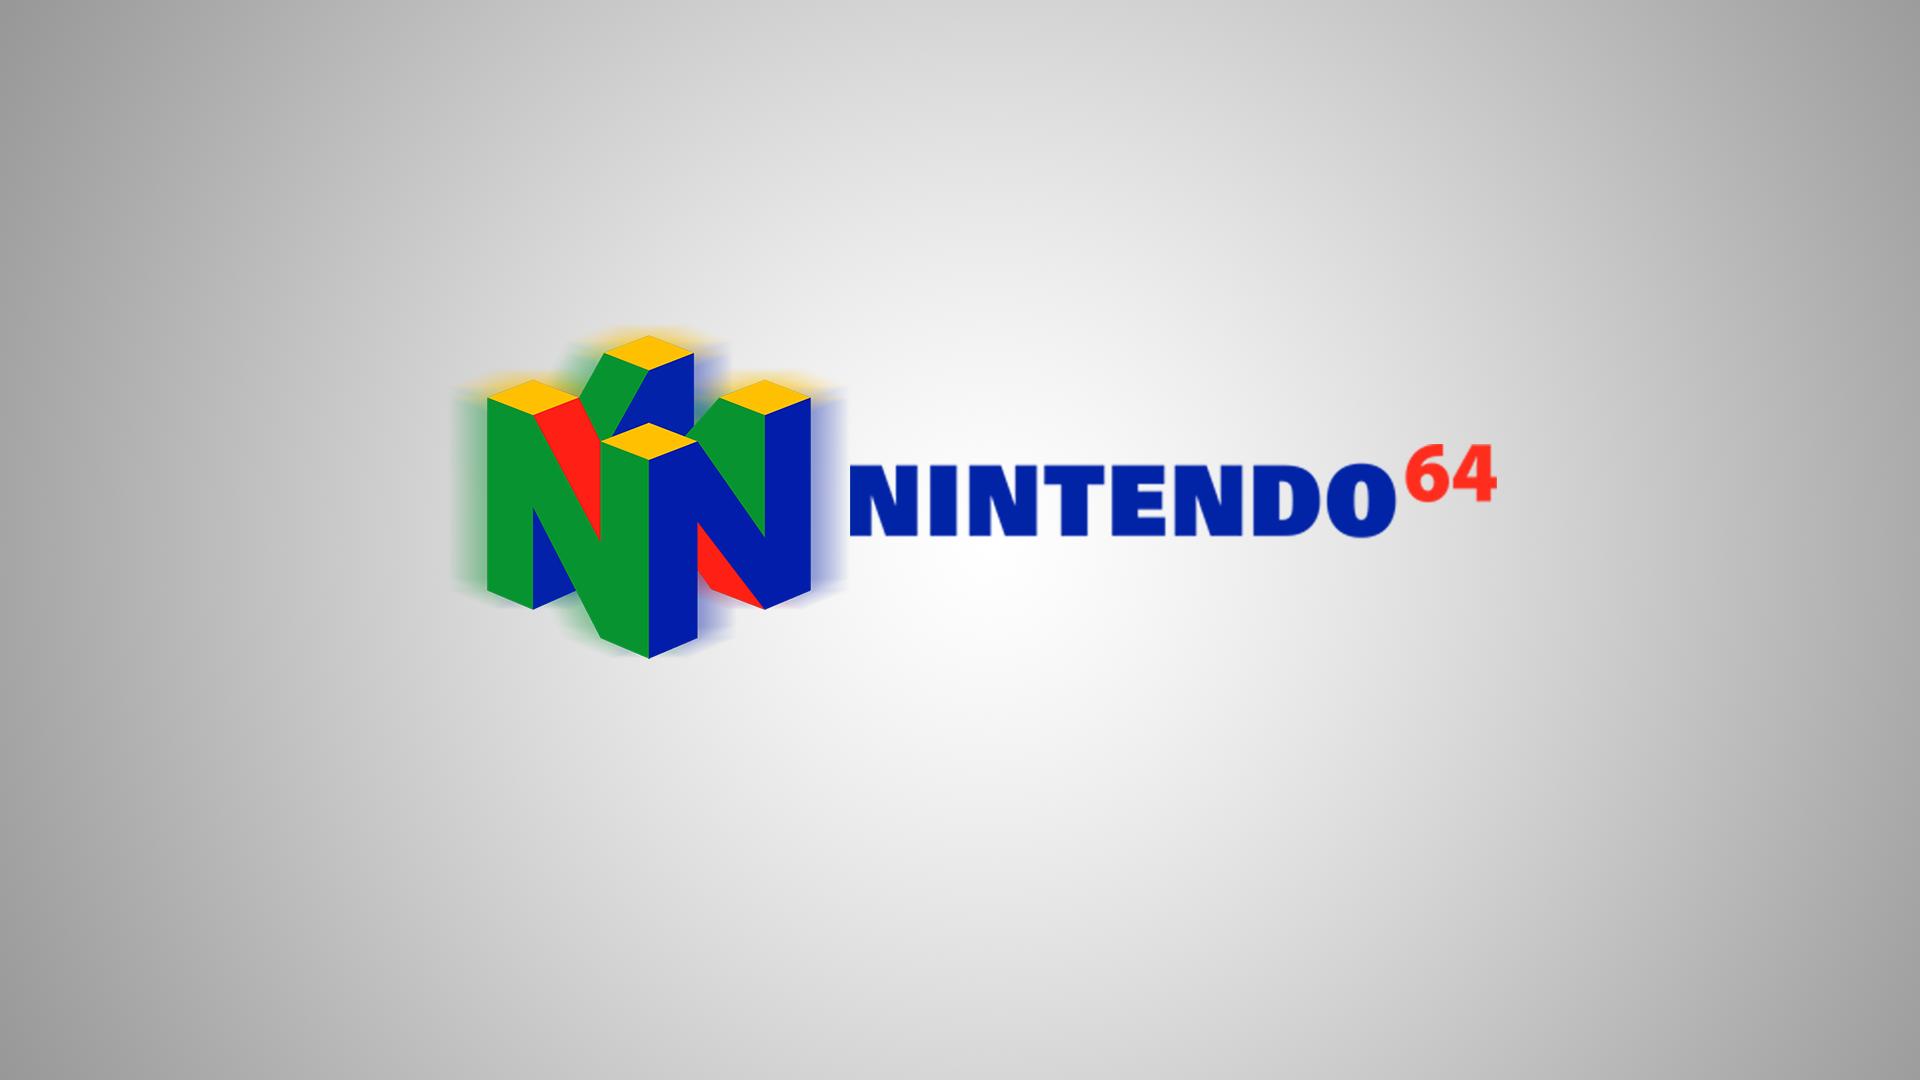 nintendo logo google images reverse search